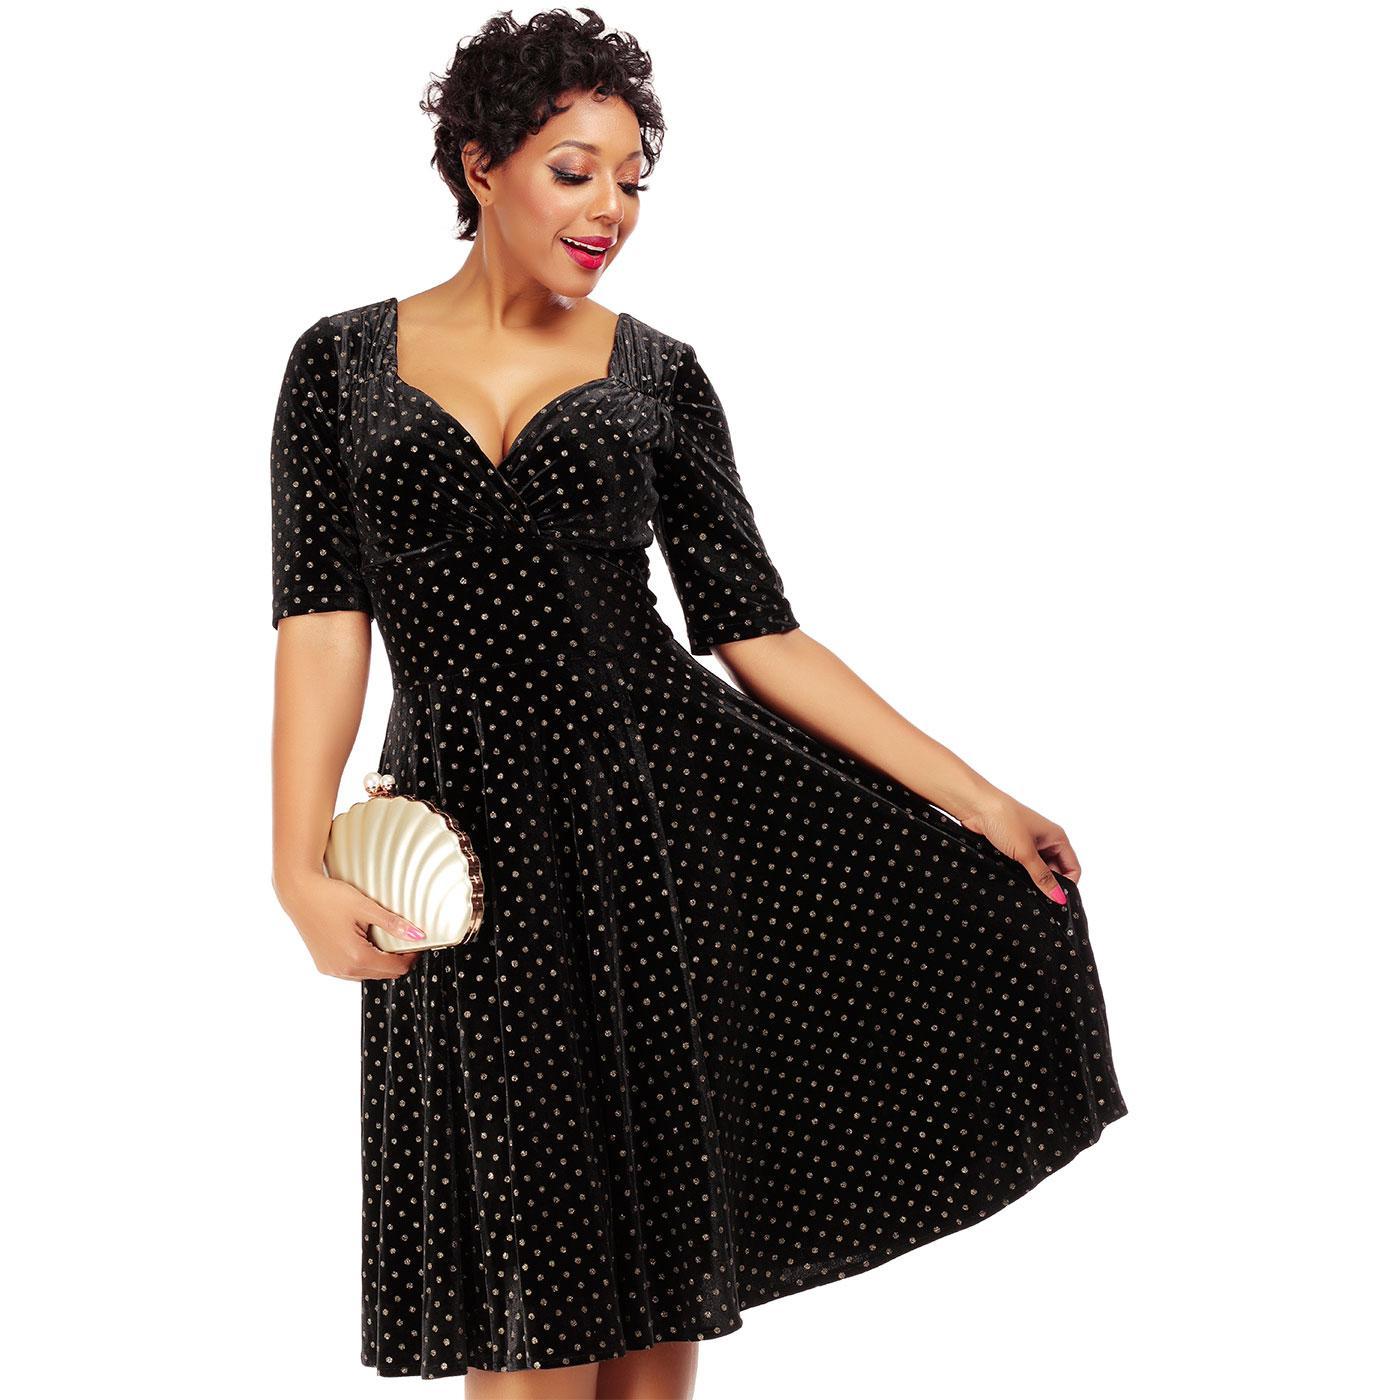 Trixie COLLECTIF 50s Golden Polka dot Swing Dress